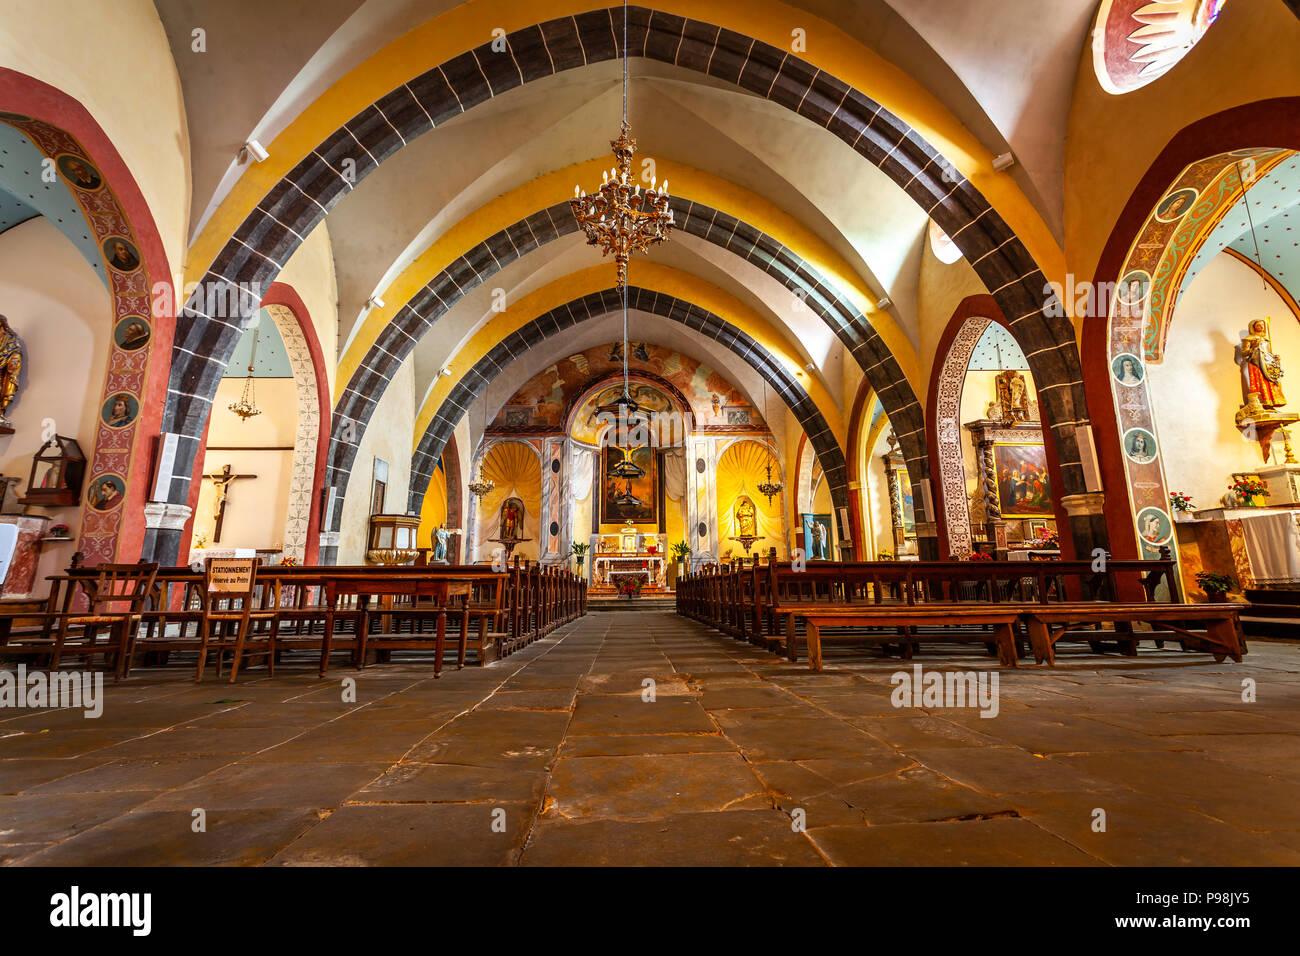 Interior of the church in the Cathar castle of Saissac near ...